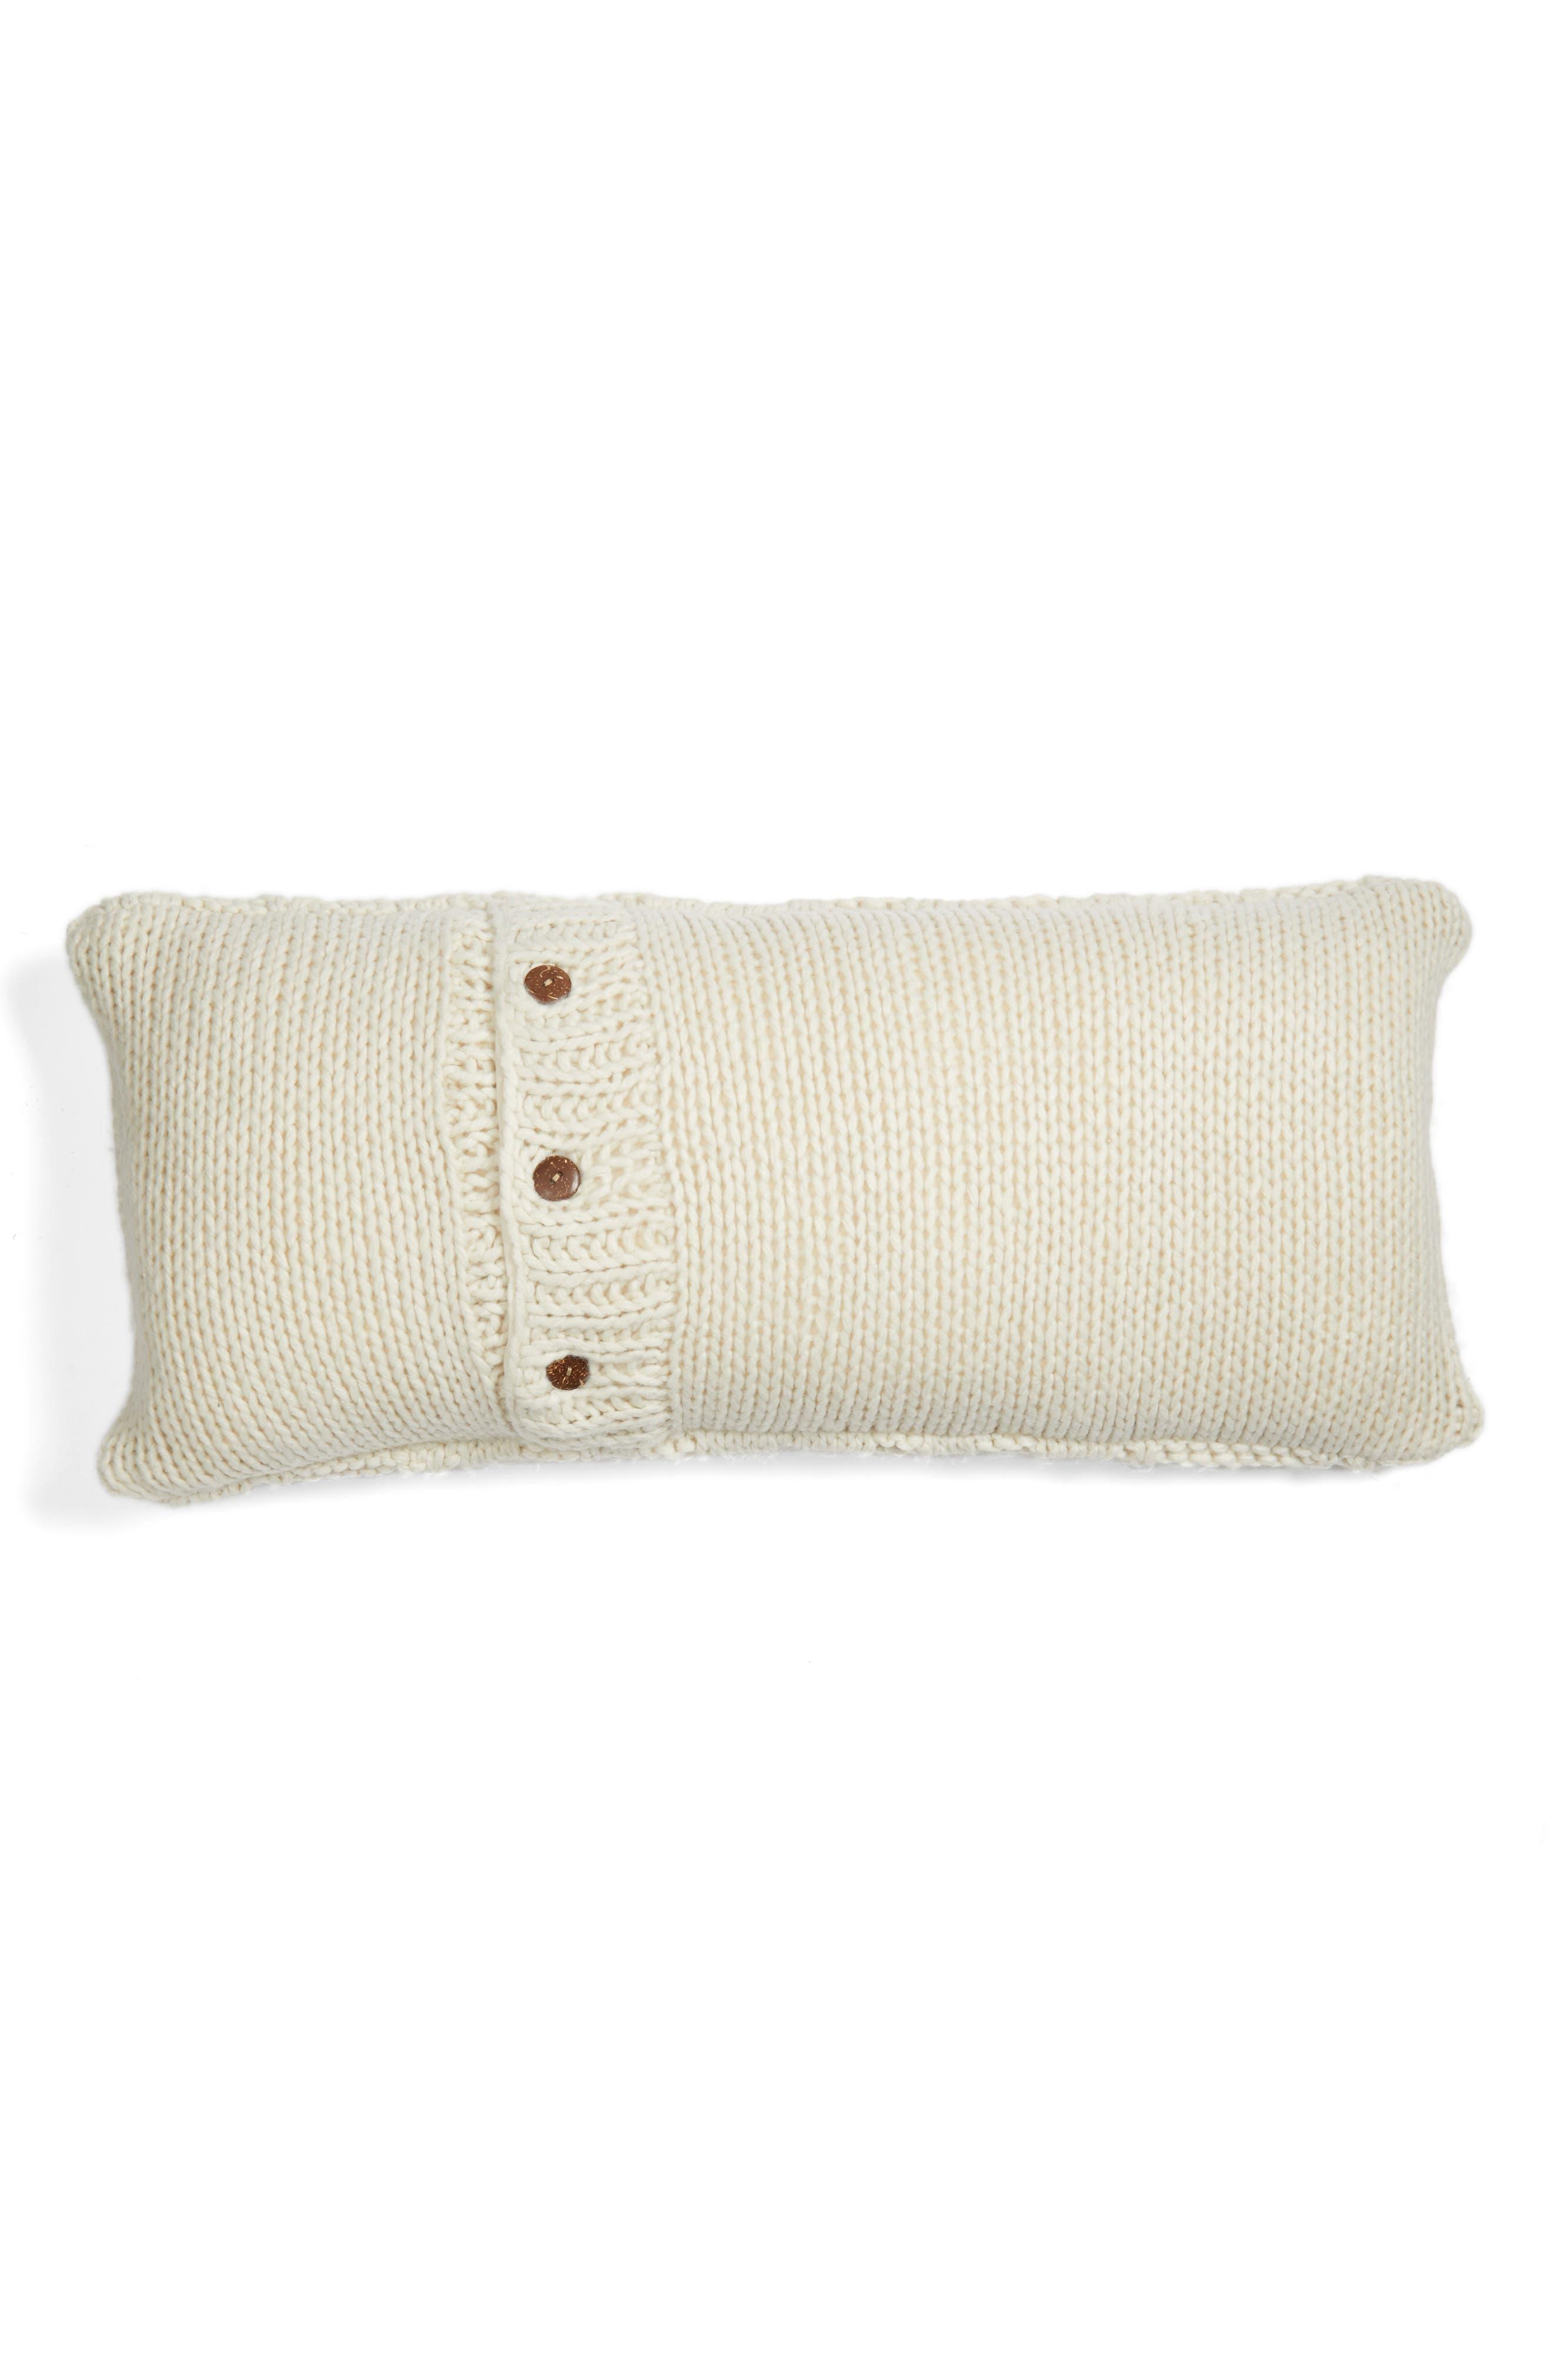 Cable Knit Accent Pillow,                             Alternate thumbnail 4, color,